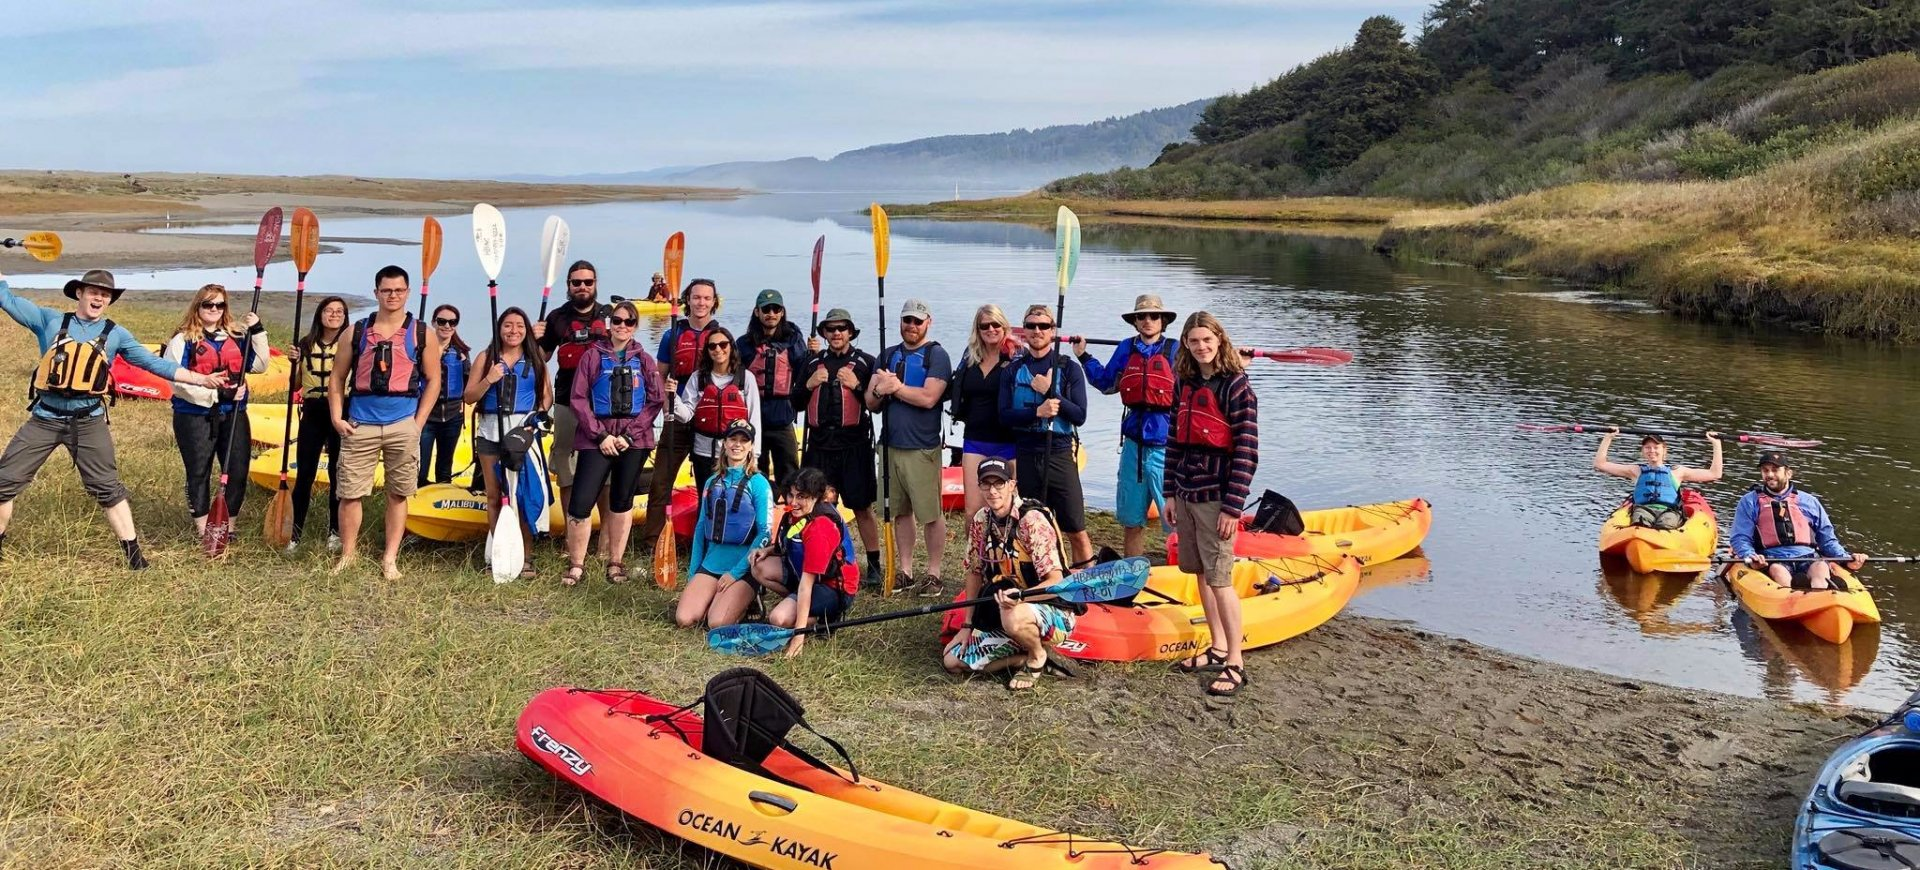 The SVA on kayaking trip to Big Lagoon Photo credit: Myra Hallman